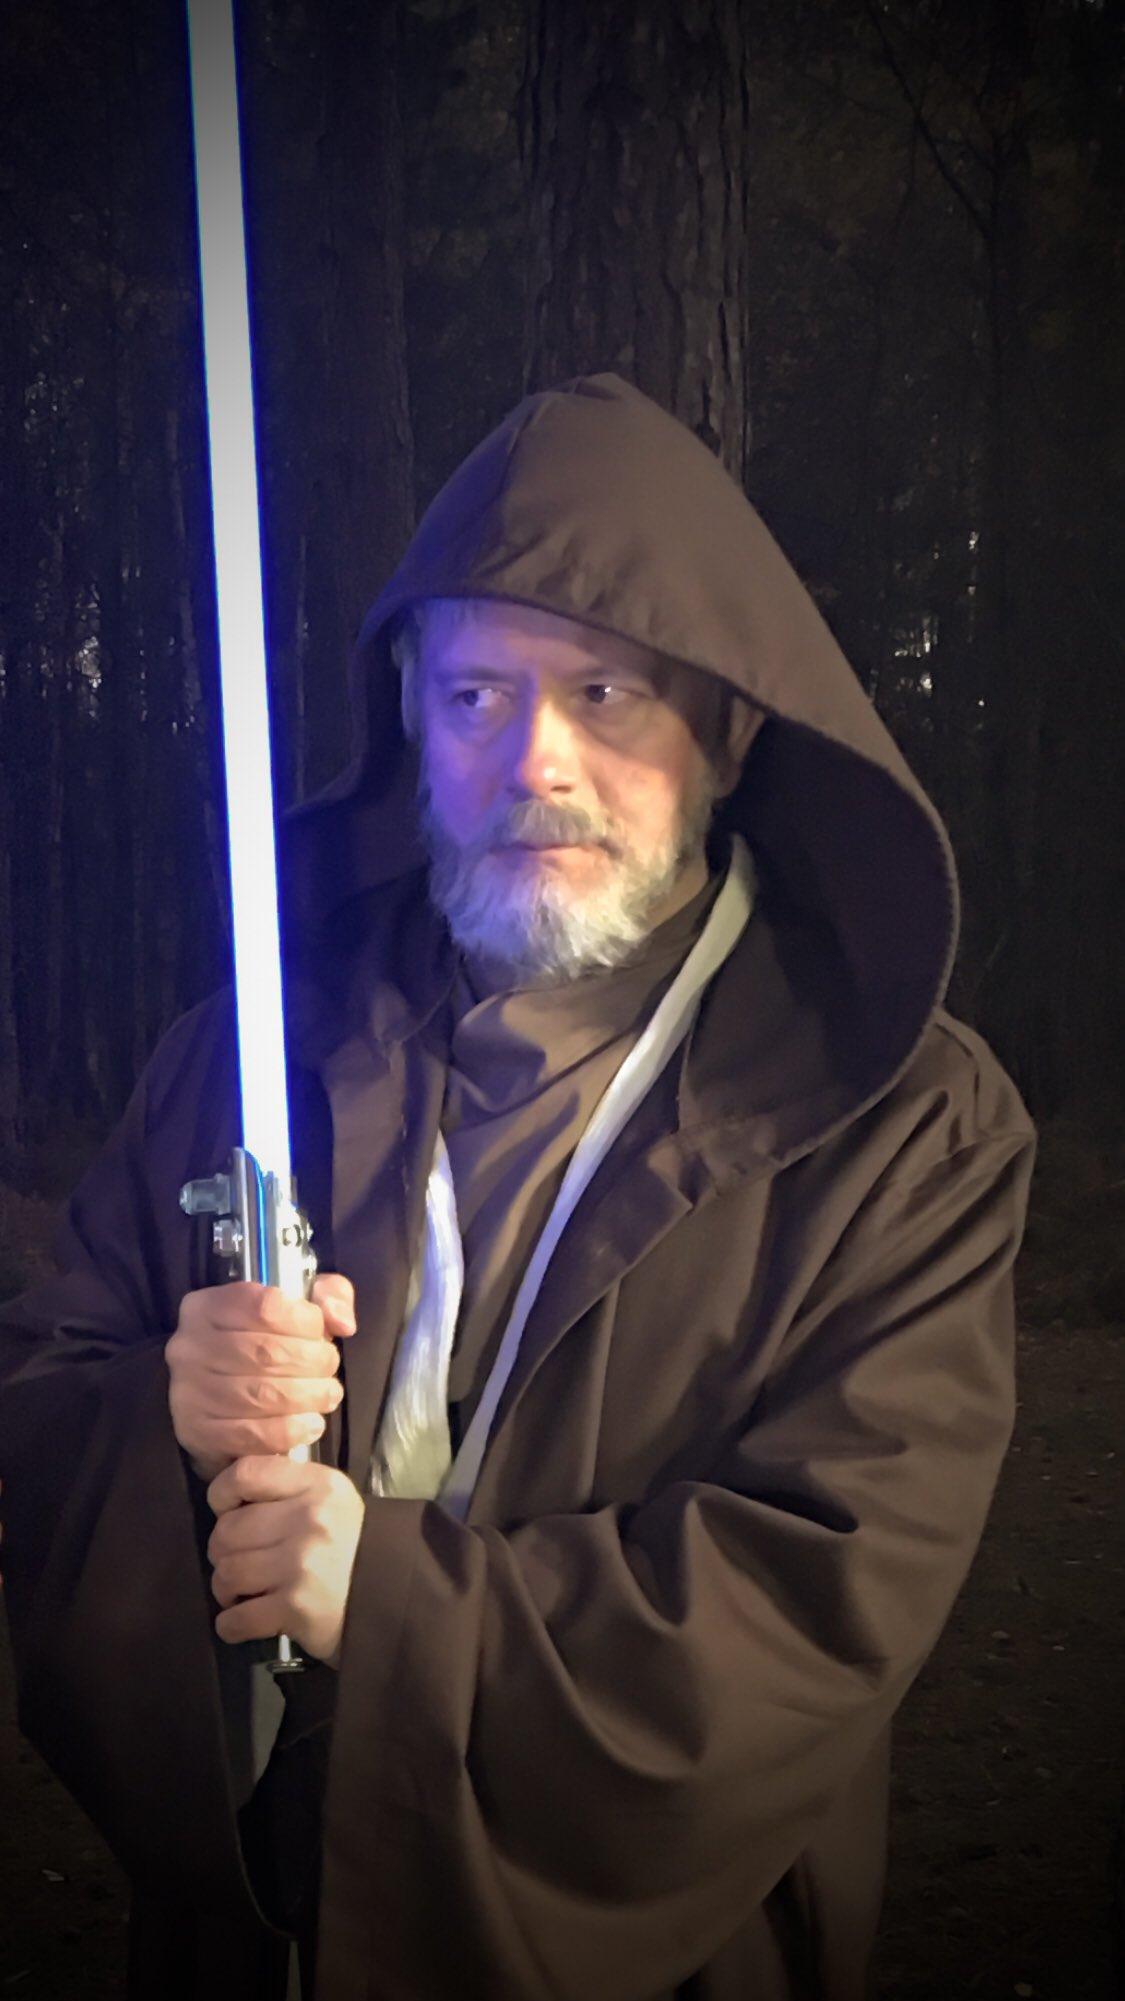 'STAR WARS: The Solo Jedi' Coming soon... https://t.co/yyW3WL3tU0